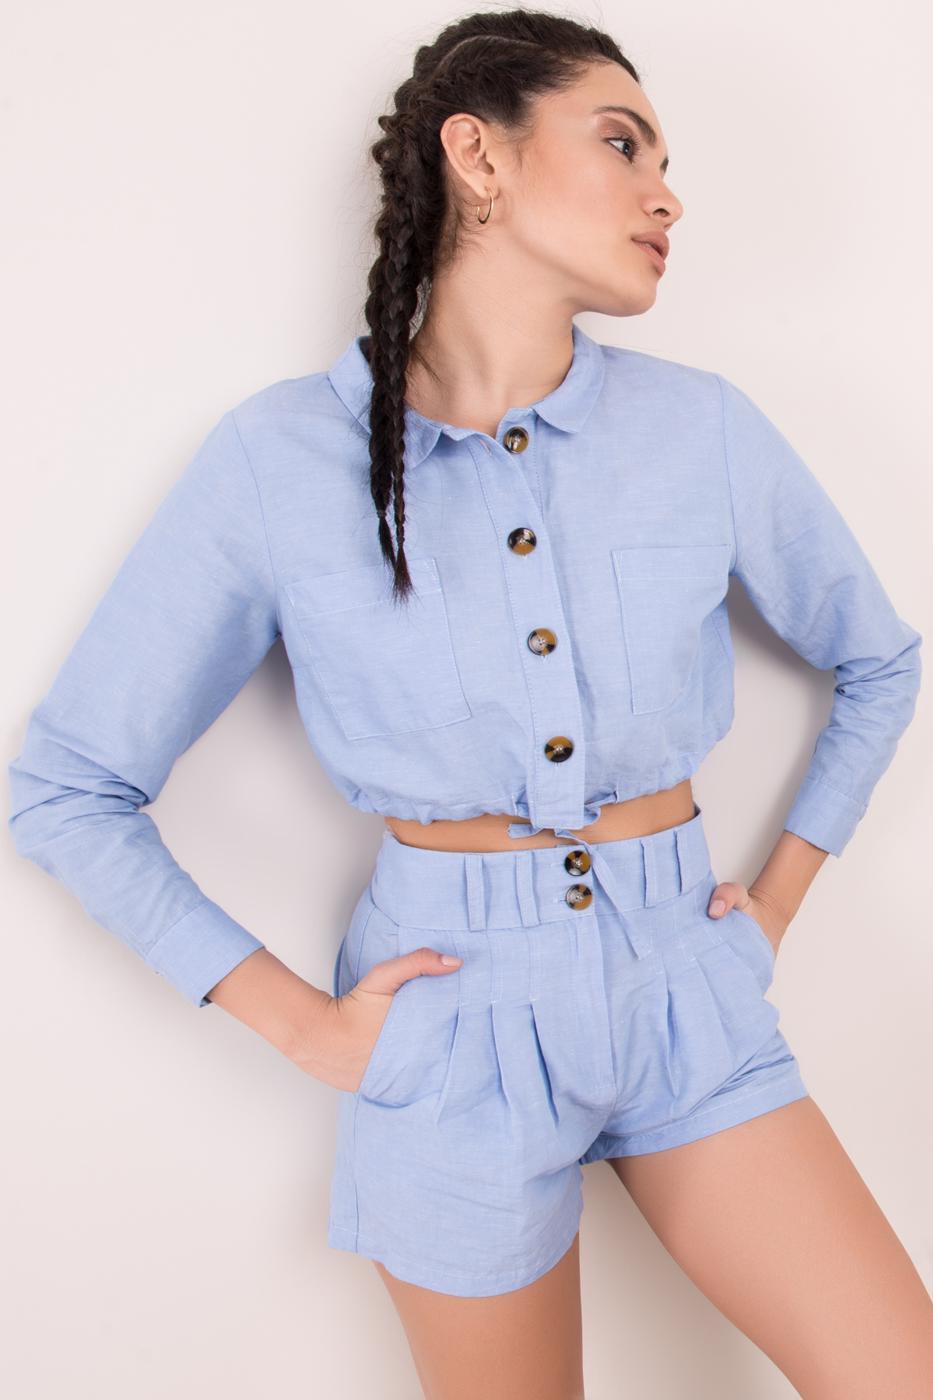 Female Blue Striped Short Jacket